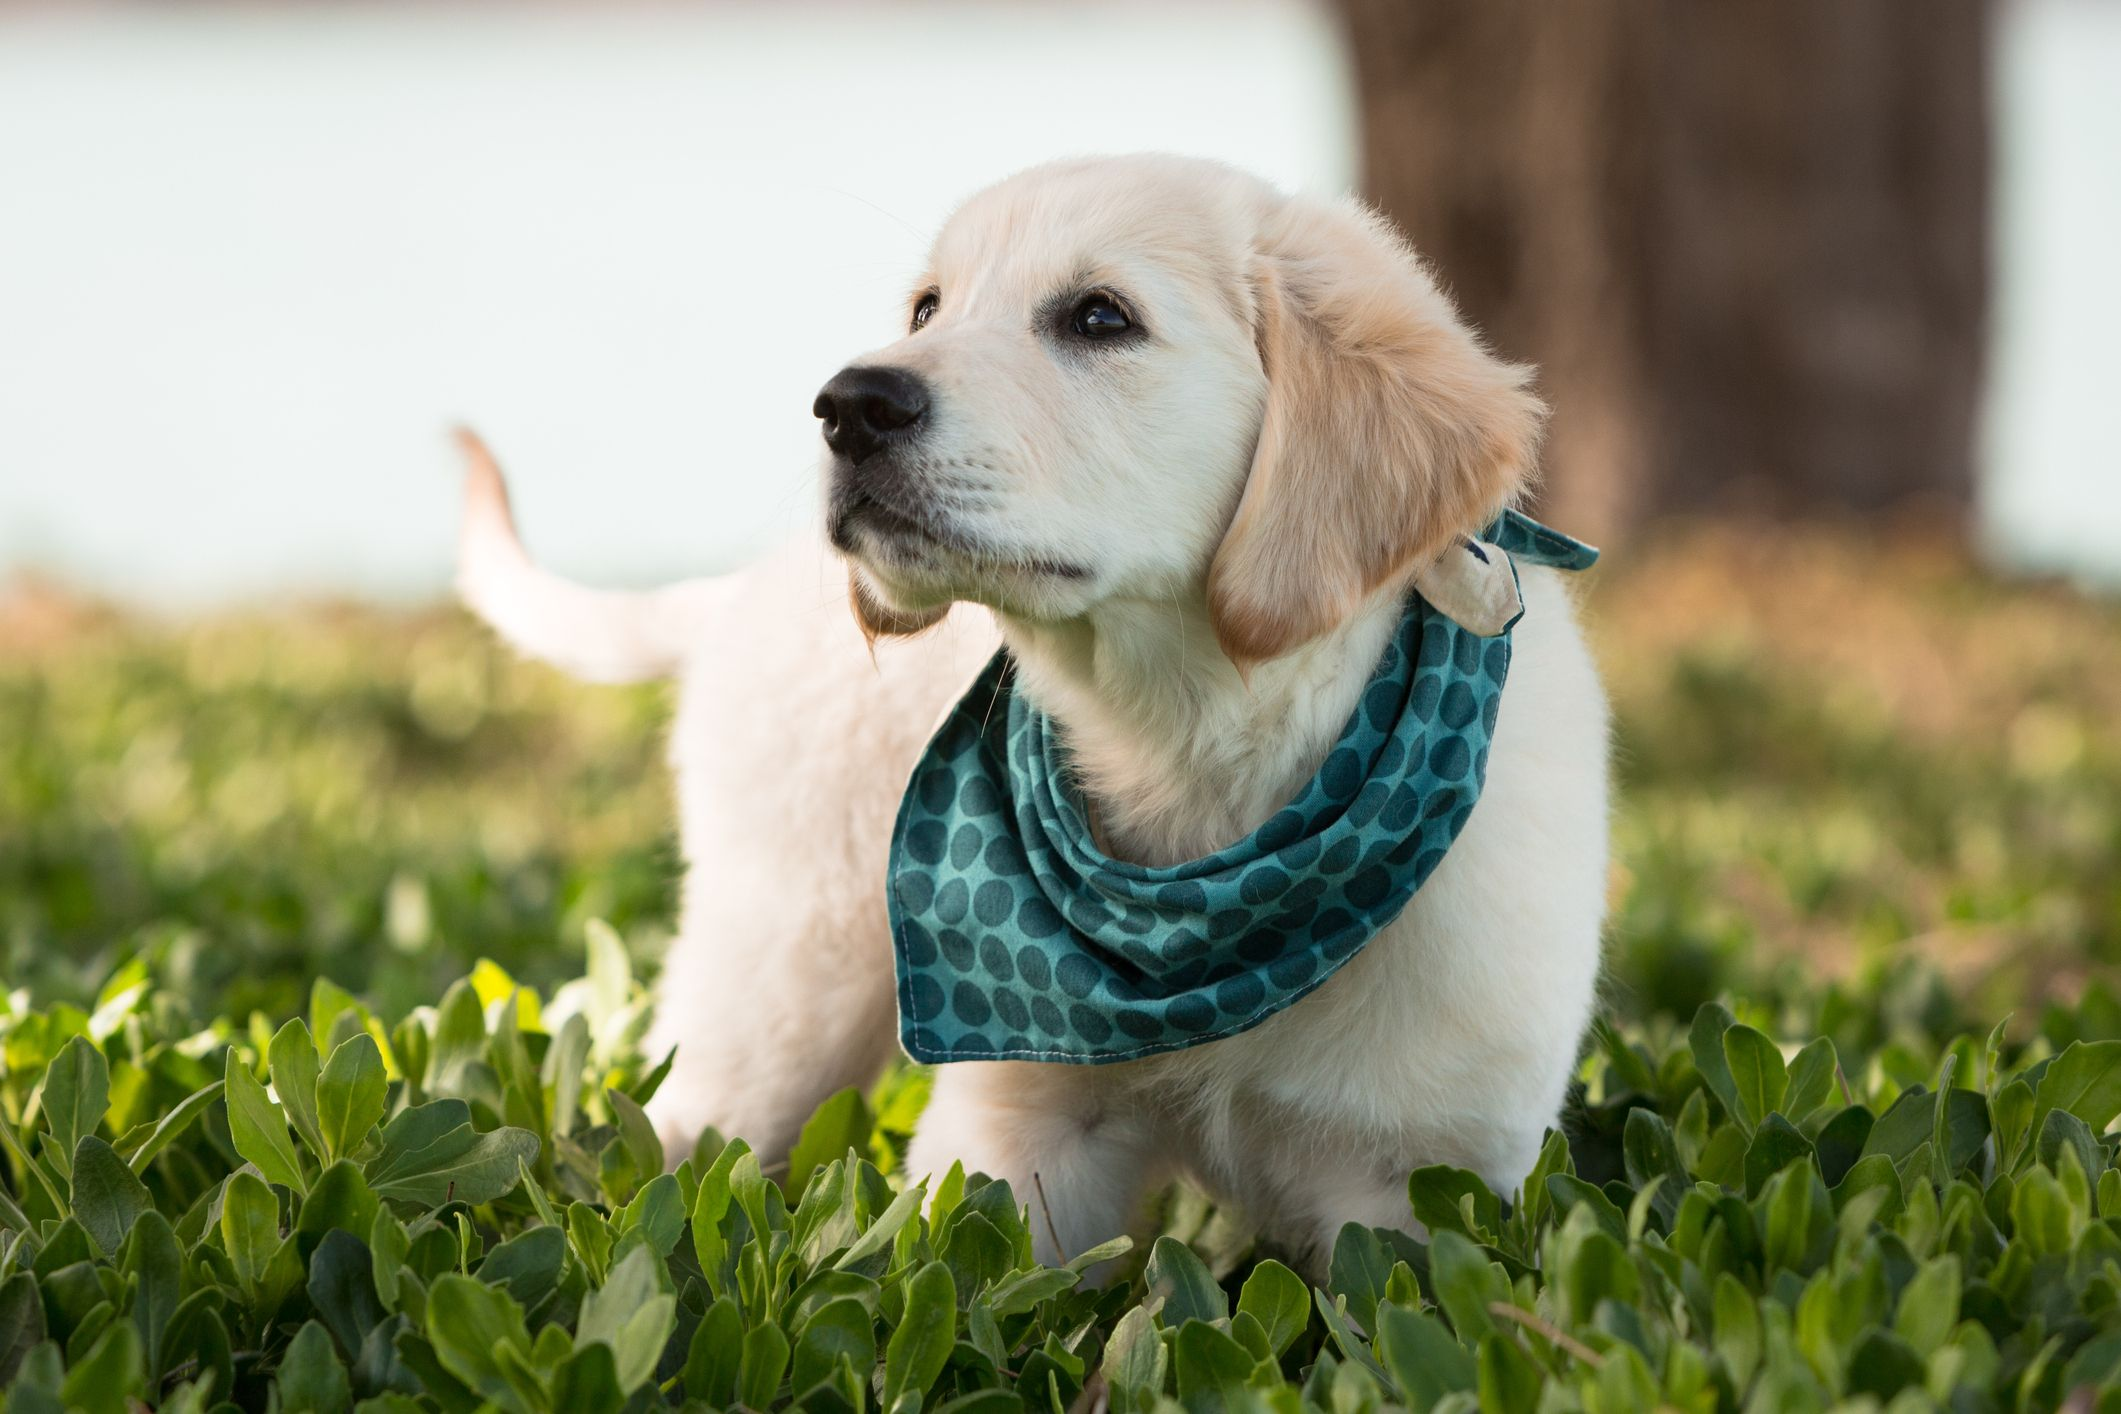 Dog Bandana Blue Flower Dog Bandana Puppy Bandanas Dog Clothes Dog Scarf Dog Bandana Collar Dog Accessories Gifts for Dogs